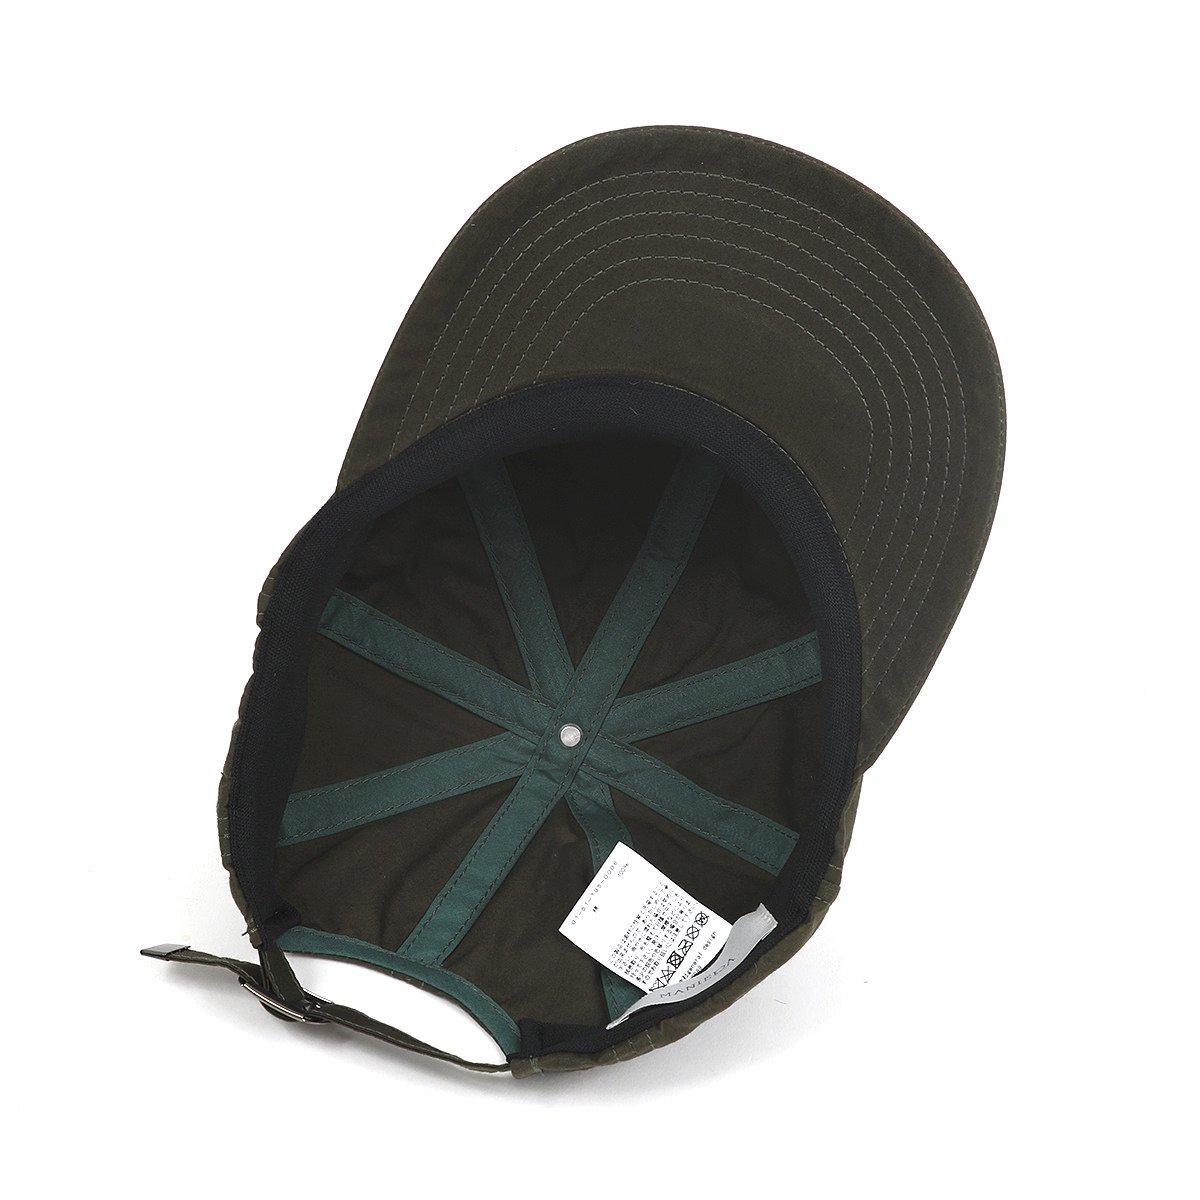 PRAFFIN CAP 詳細画像6